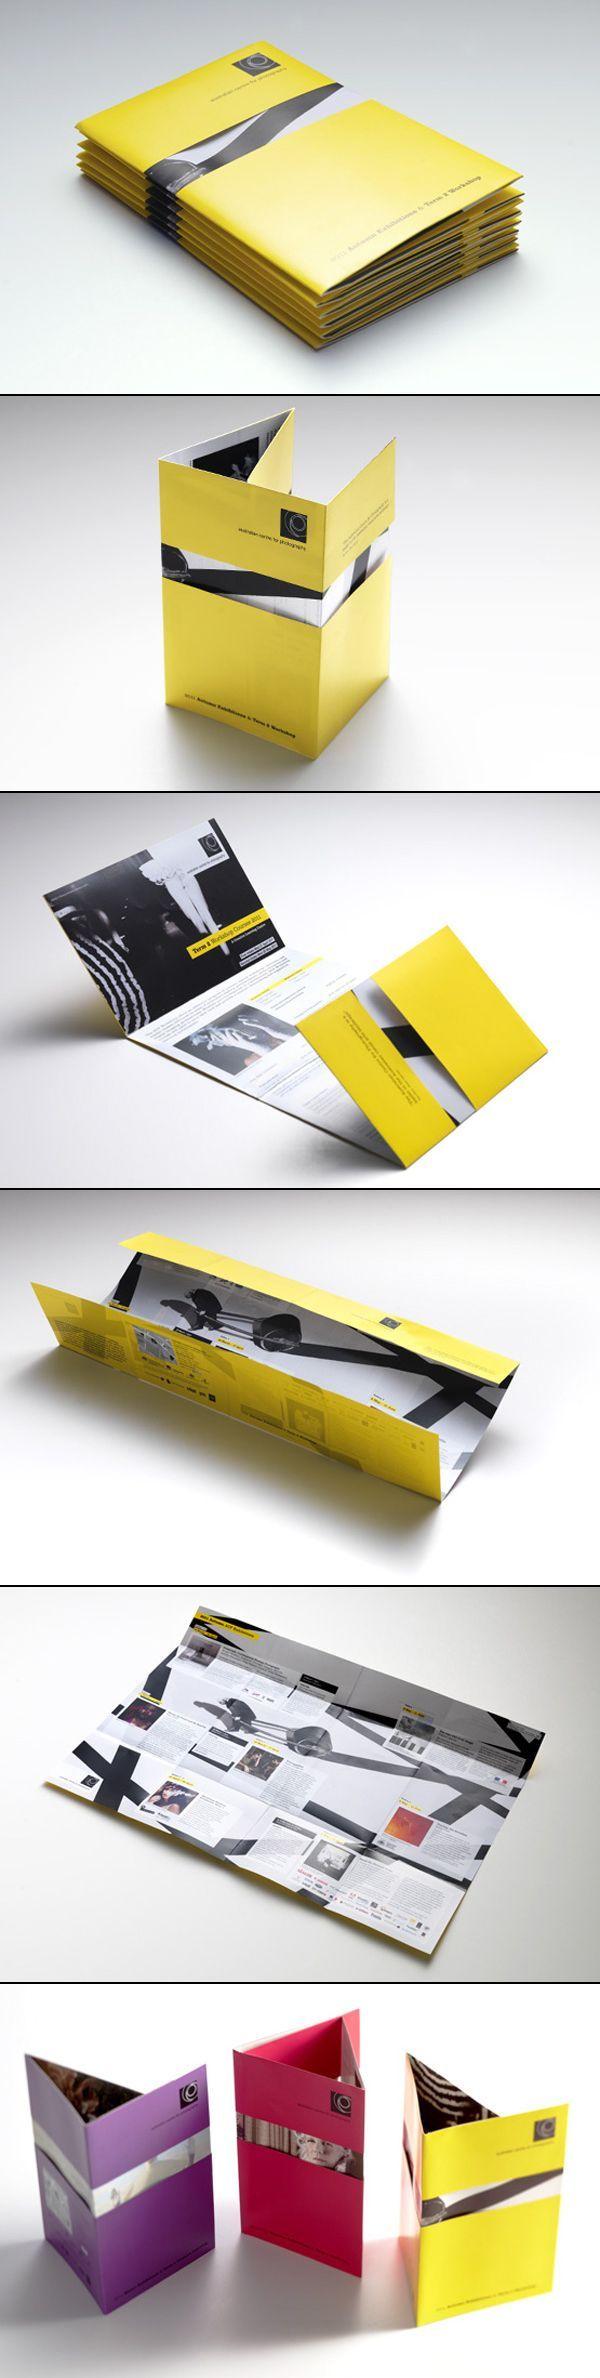 Clever design inspirational brochure | Stay Creative blog